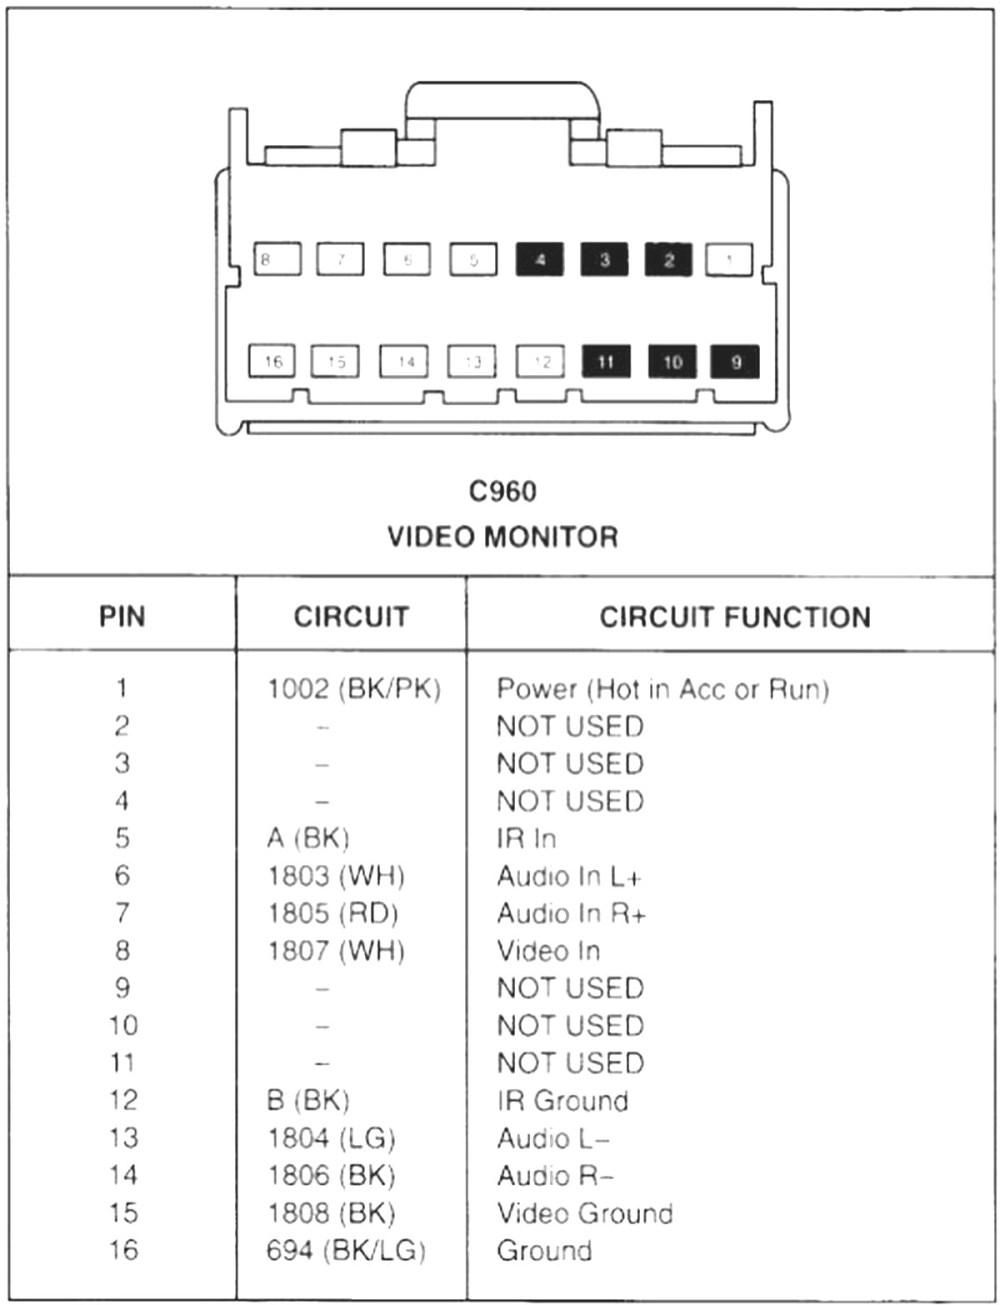 medium resolution of sony cdx gt520 car stereo wiring diagram basic electronics wiringaem headphone bose stereo wiring diagram wiring